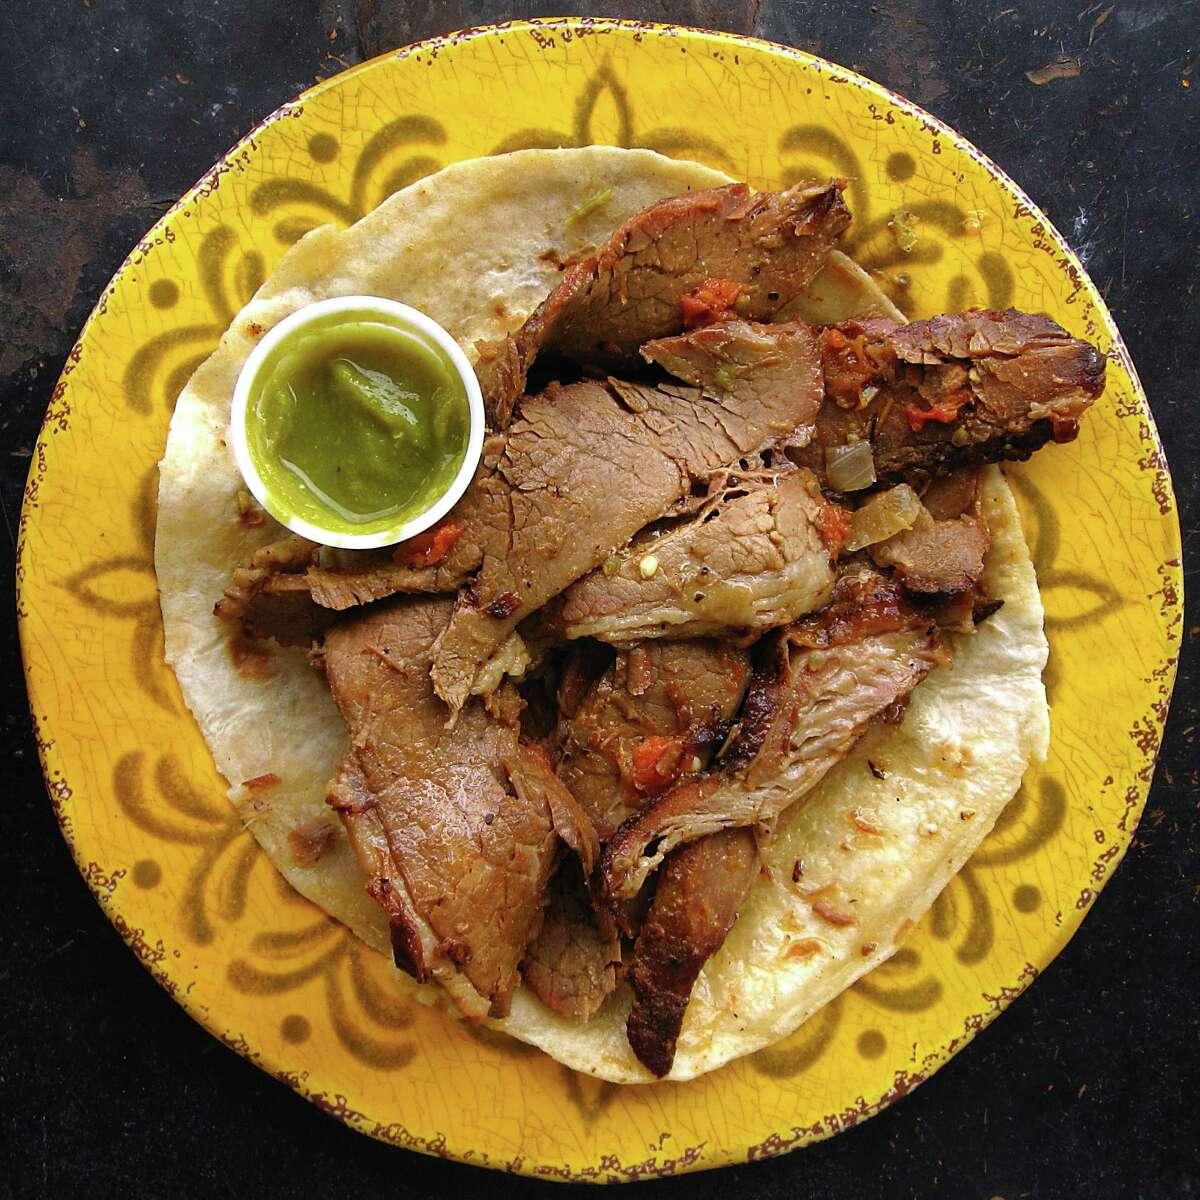 Brisket taco on a handmade flour tortilla from Chas Market & Kitchen on North Pine Street in San Antonio.